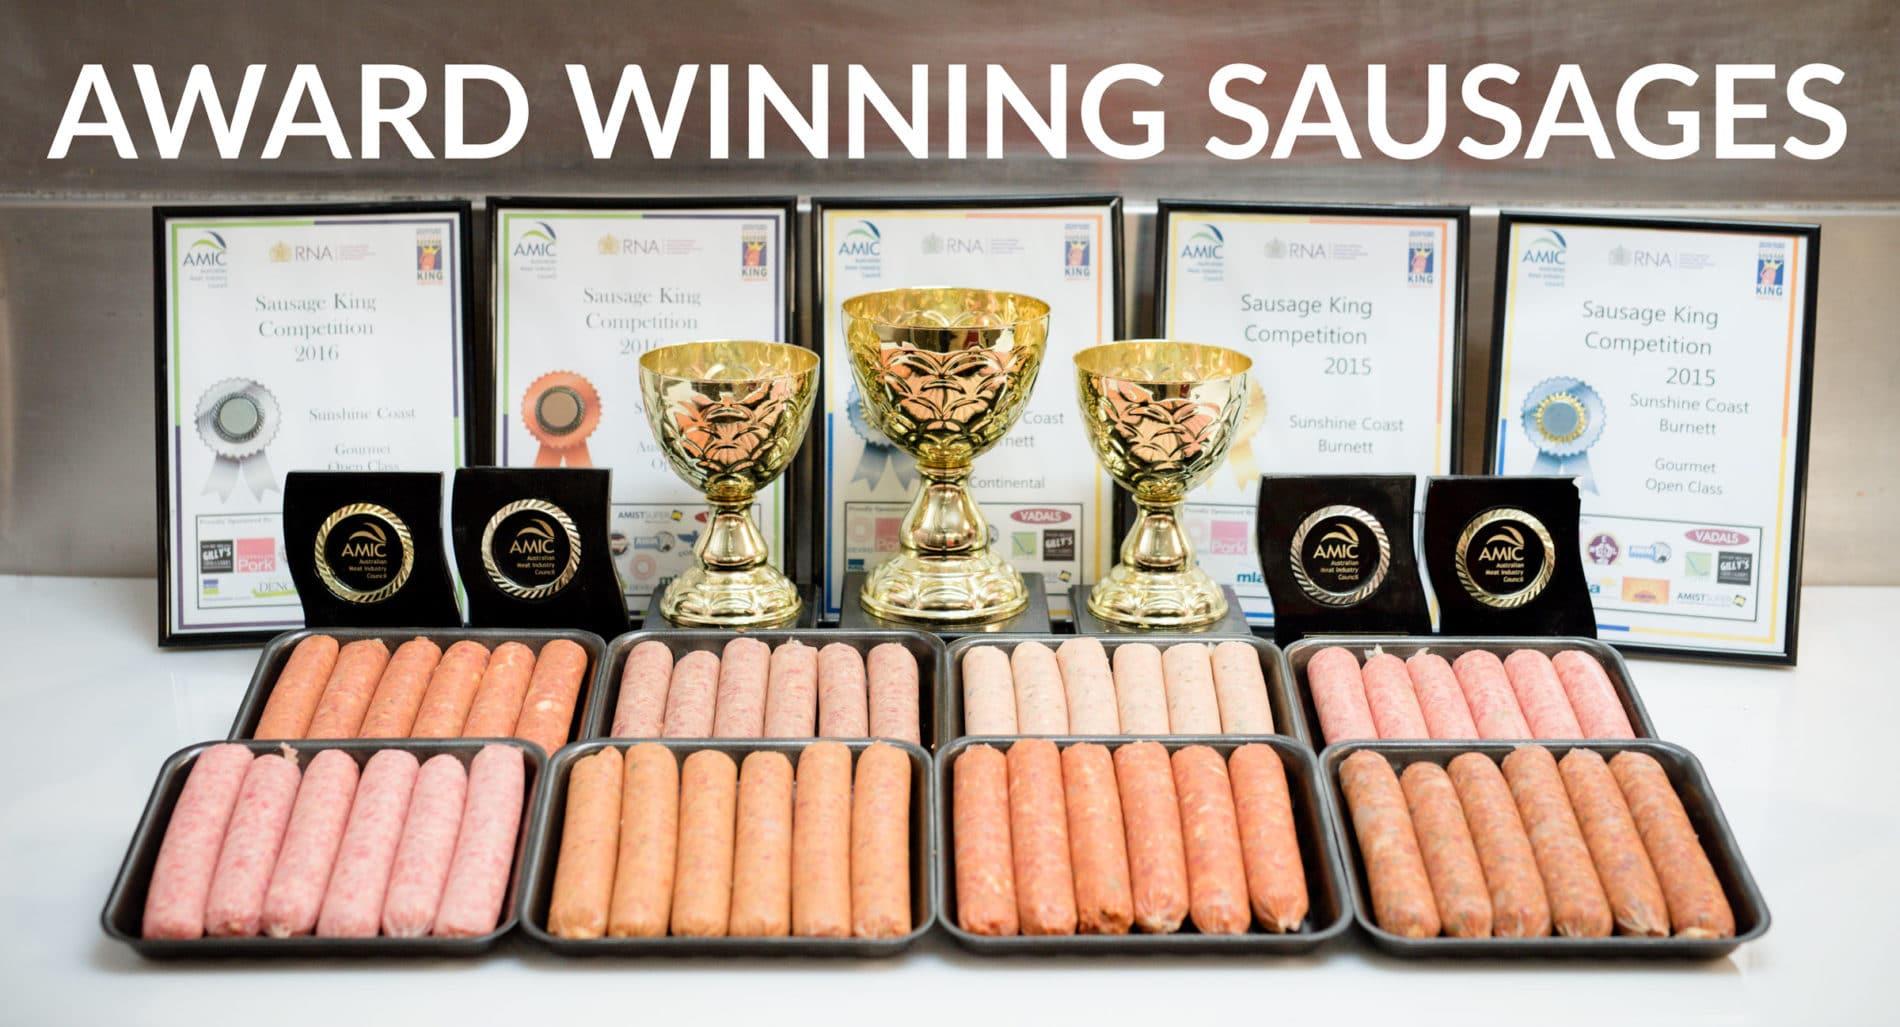 Gourmet Sausage King & Best Burger Champions